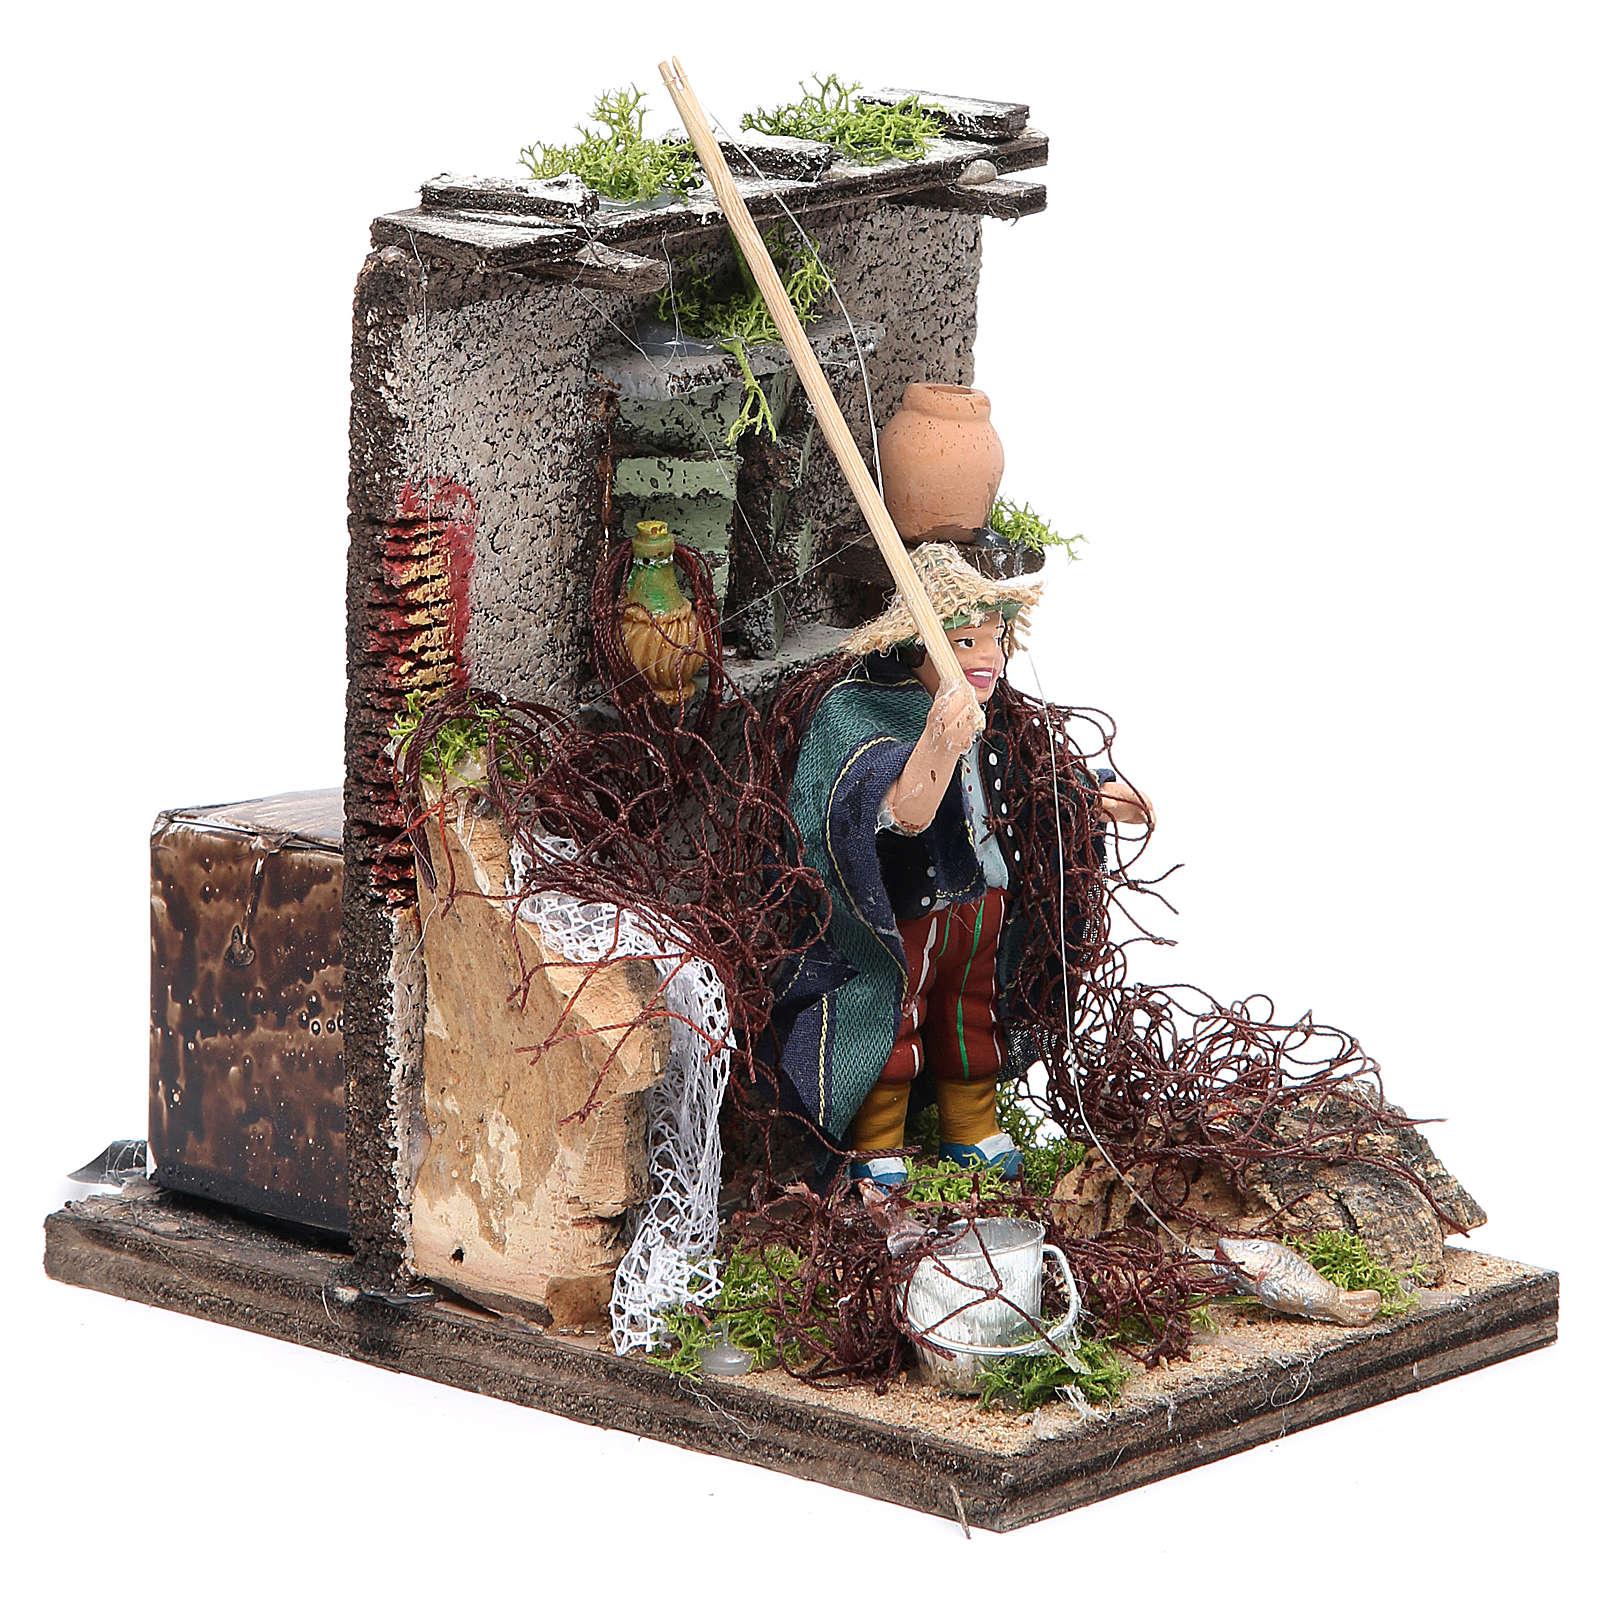 Fisherman animated figurine for Neapolitan Nativity, 10cm 4